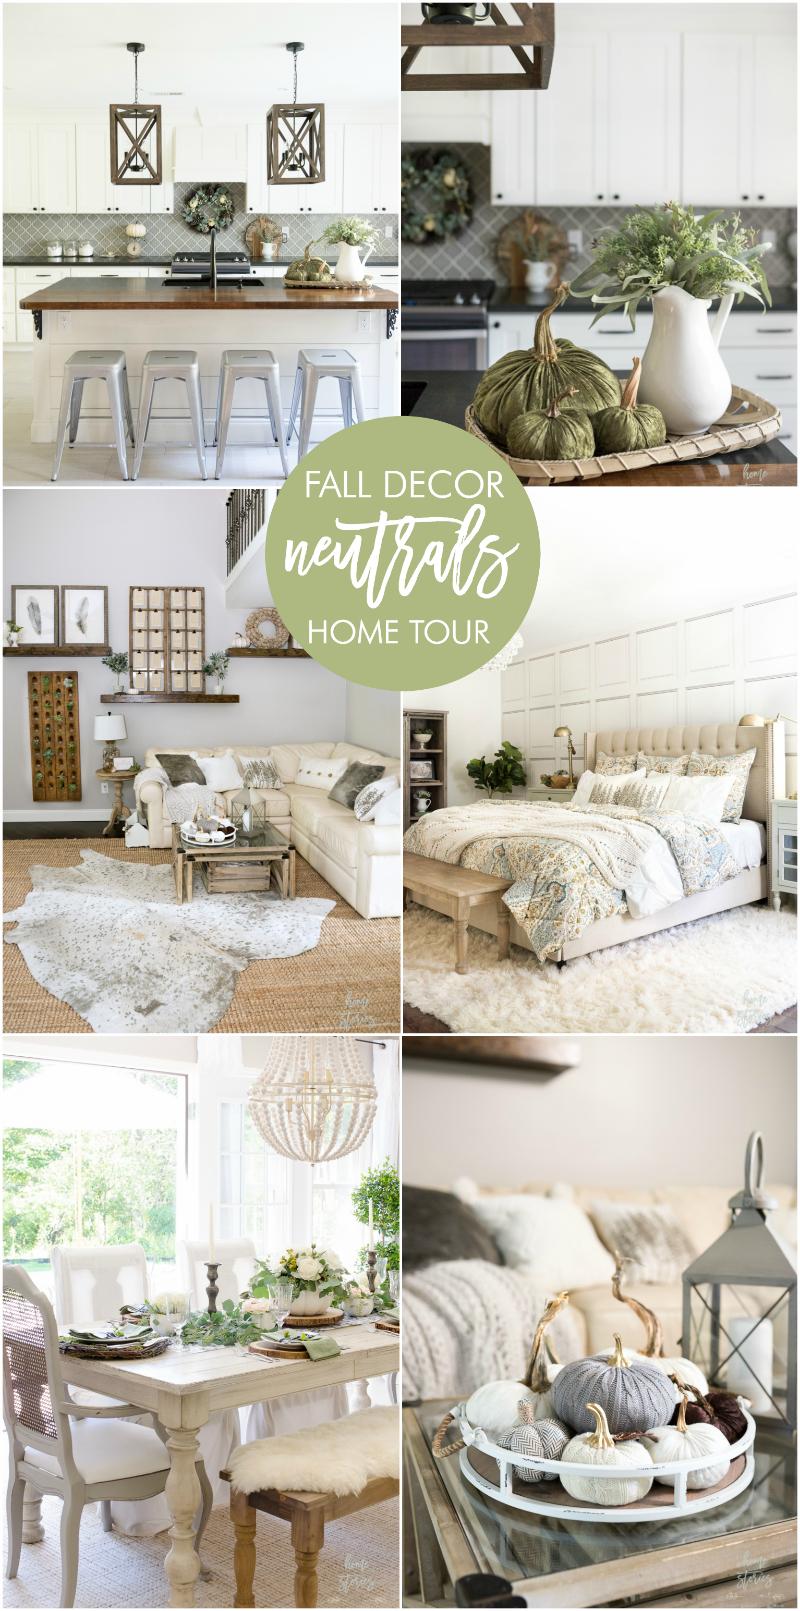 Neutral Fall Decor Home Tour | DIY Home Decor Ideas | Pinterest ...